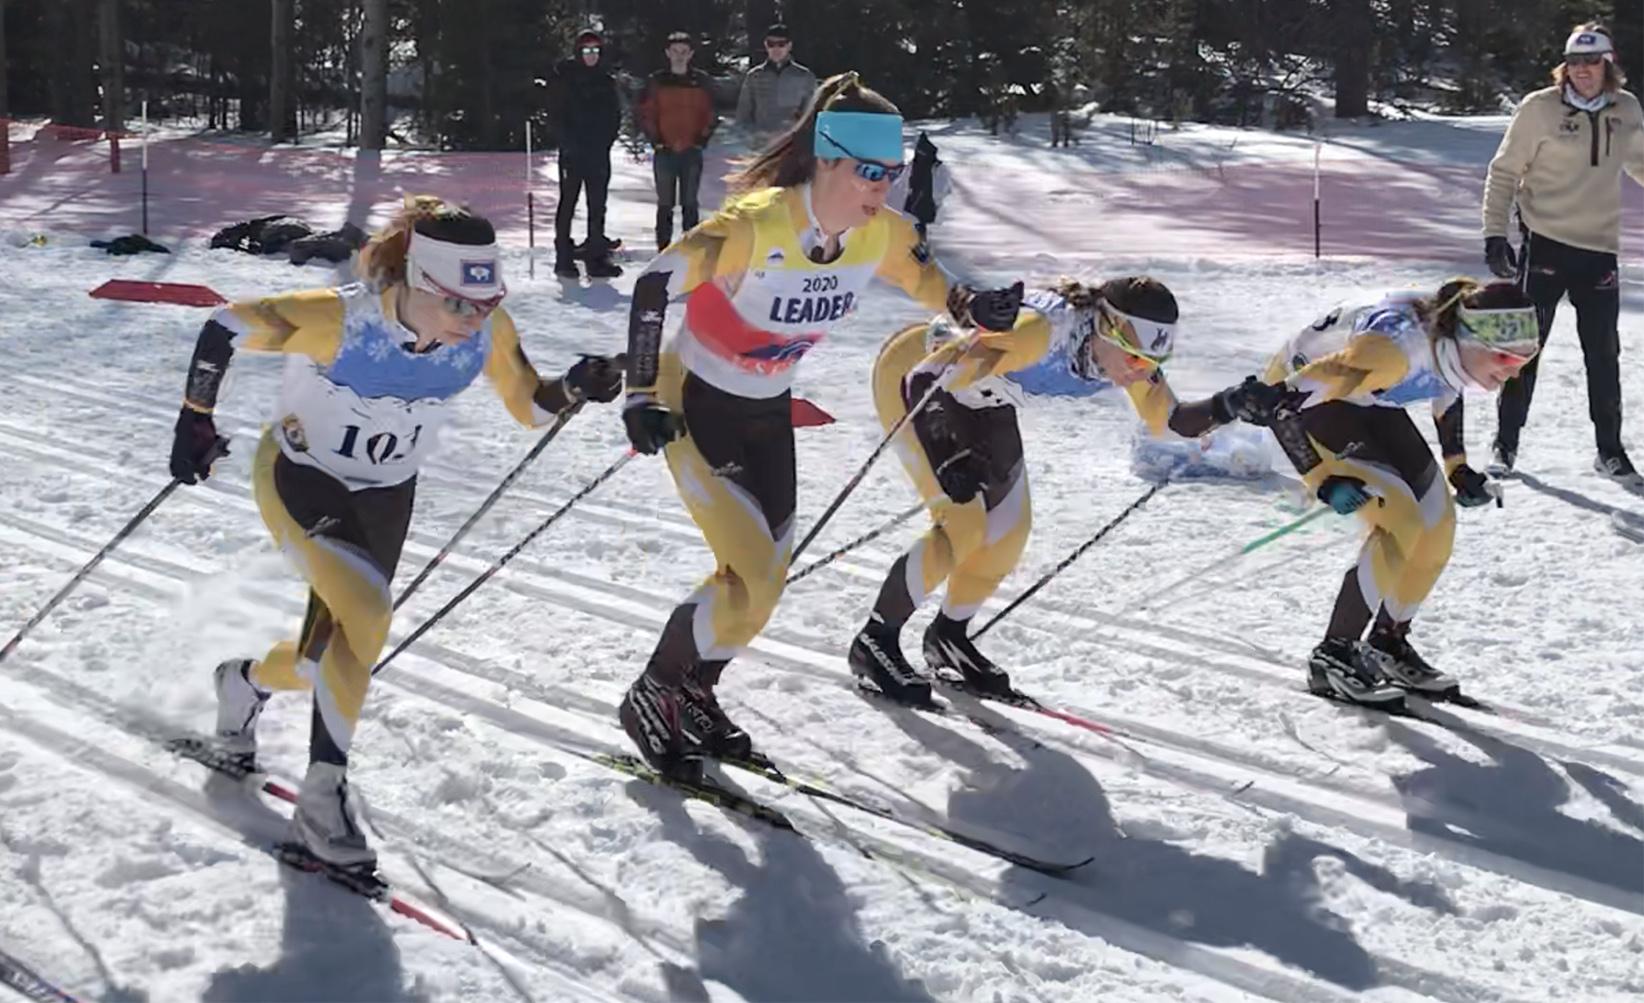 UW Nordic Ski Teams are Conference Champions